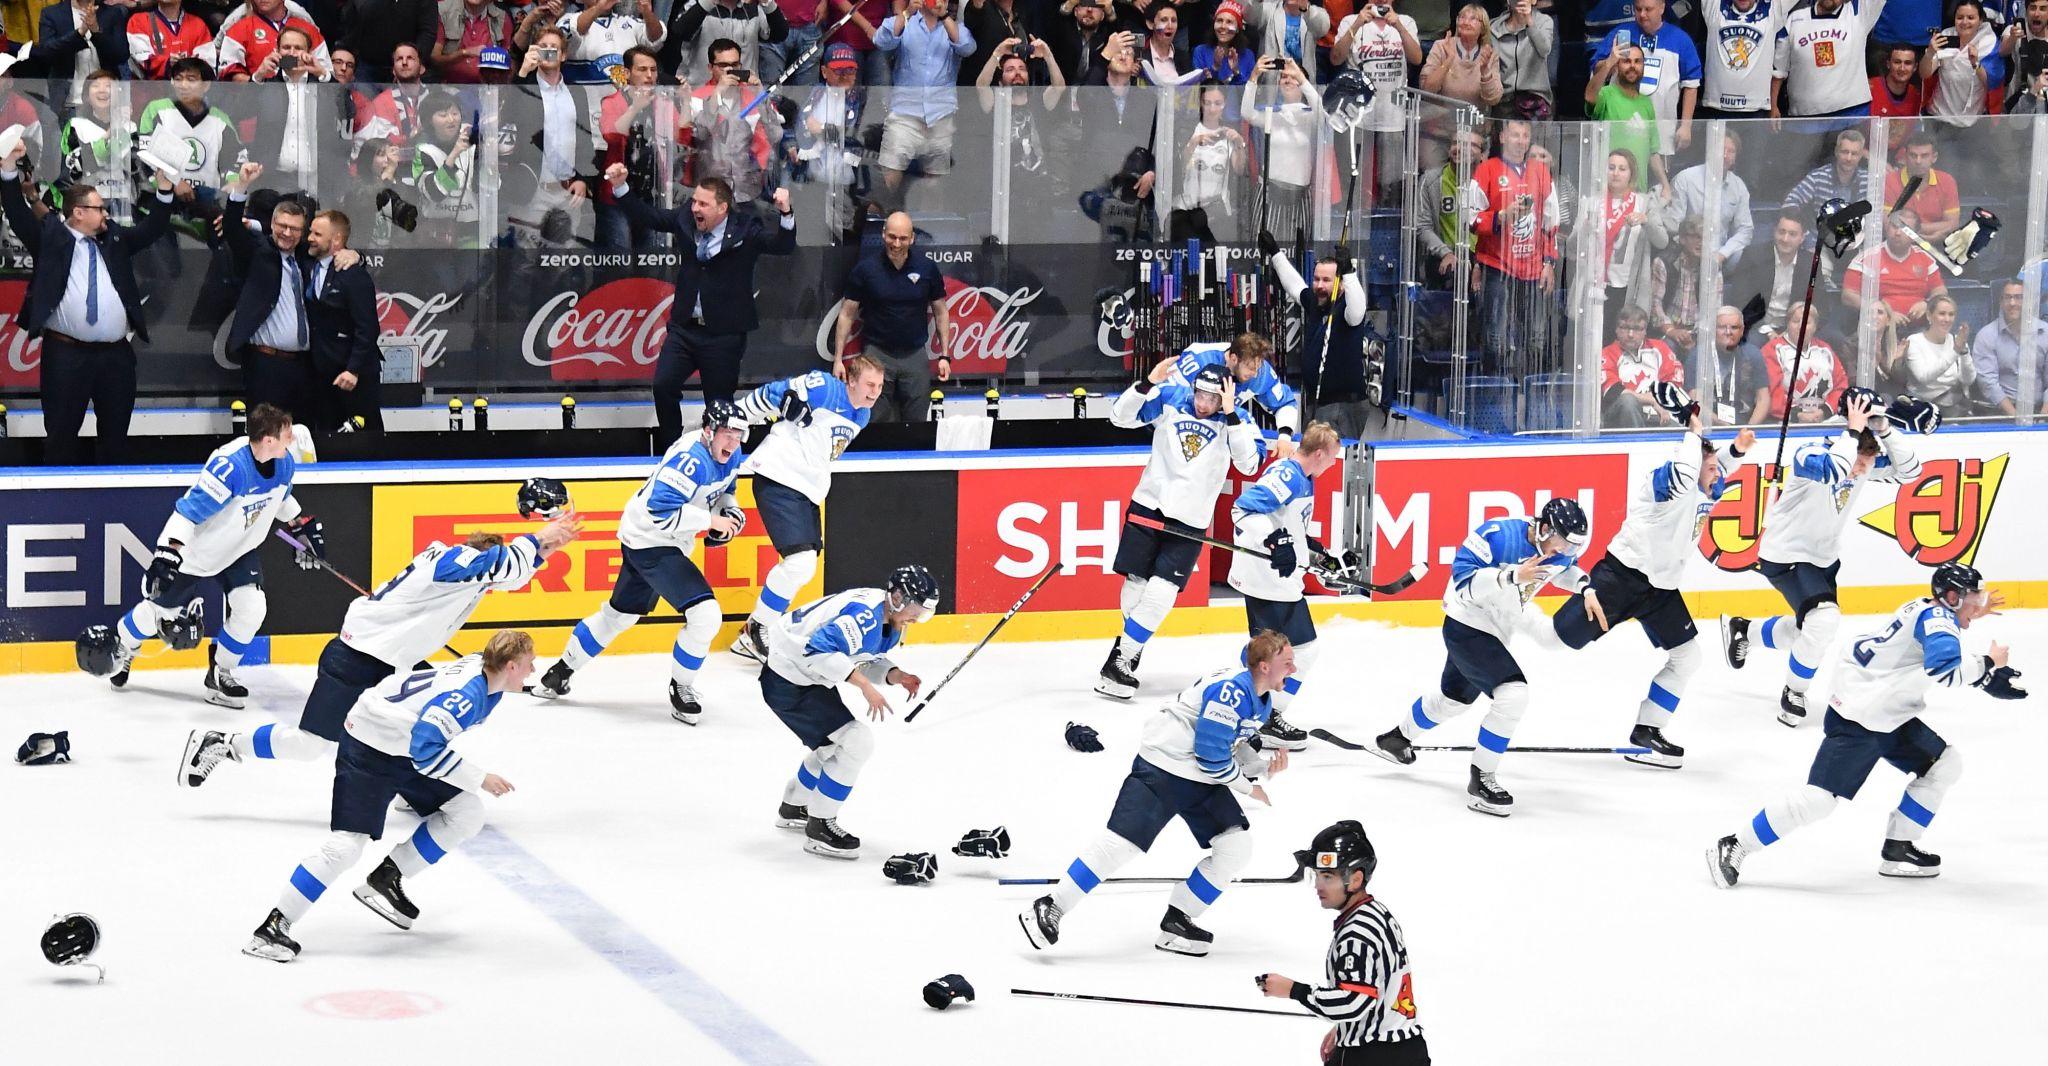 Finland beats Canada to claim world hockey championship